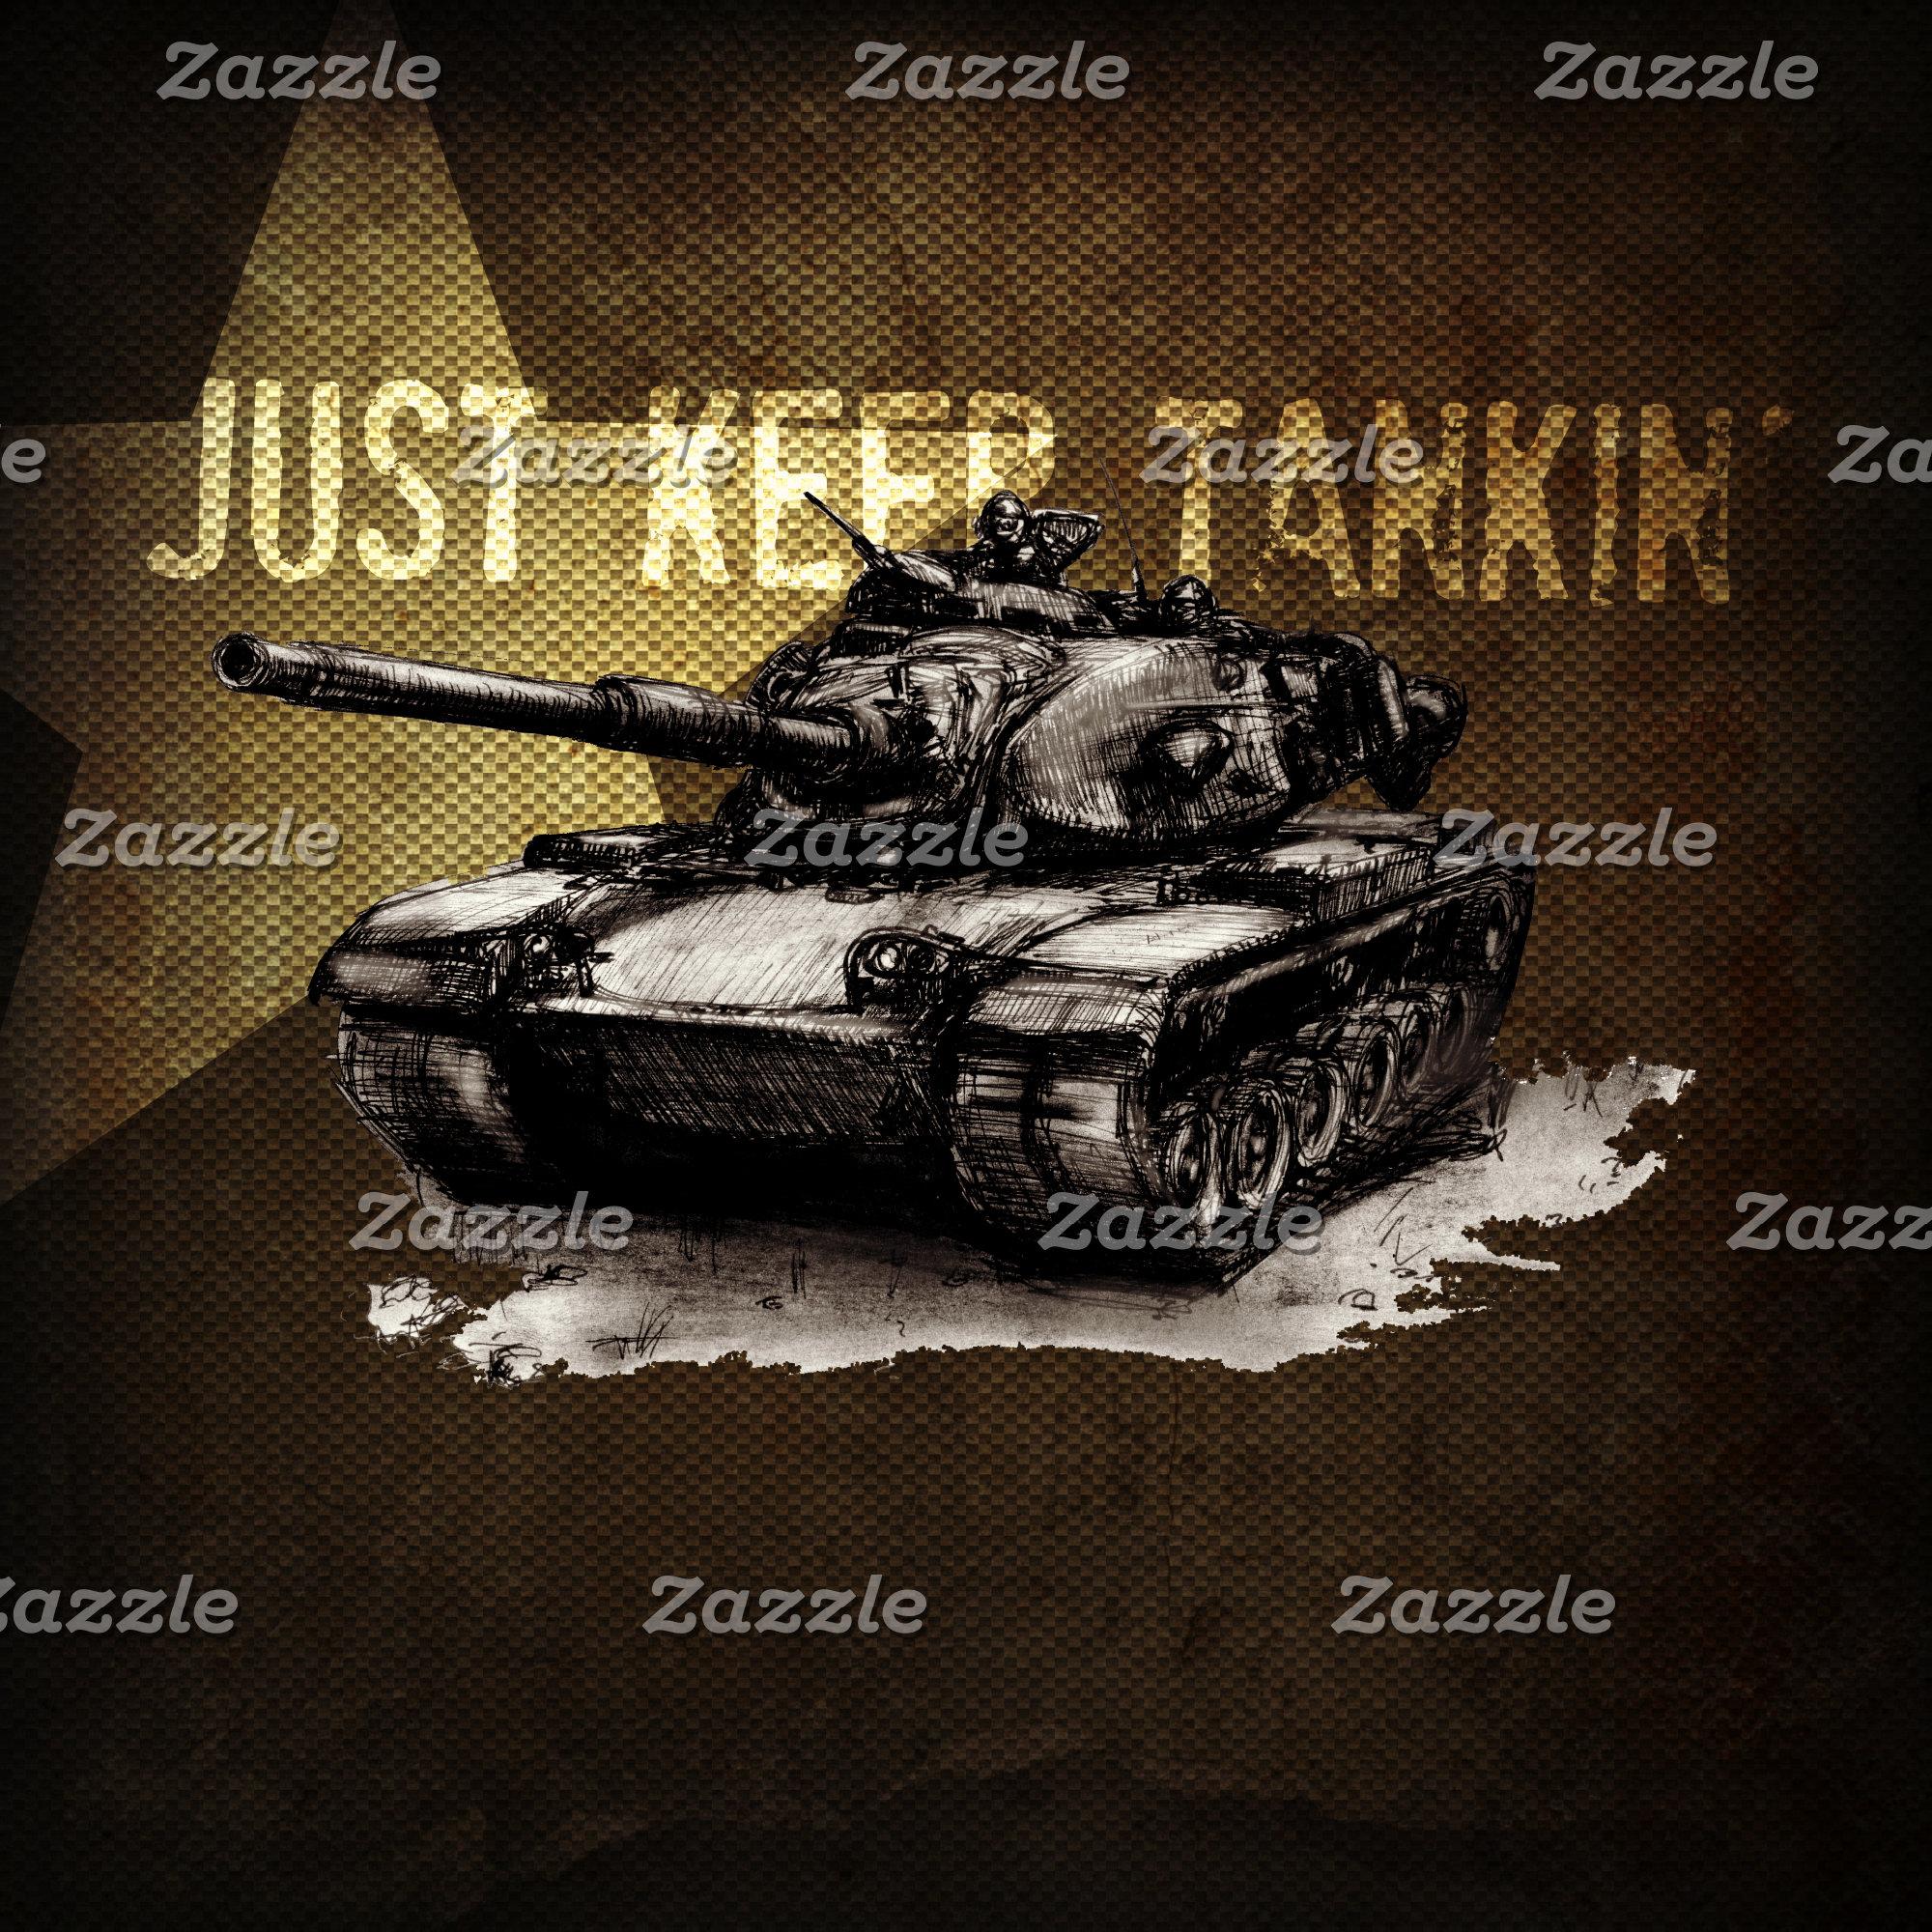 M60 Main Battle Tank